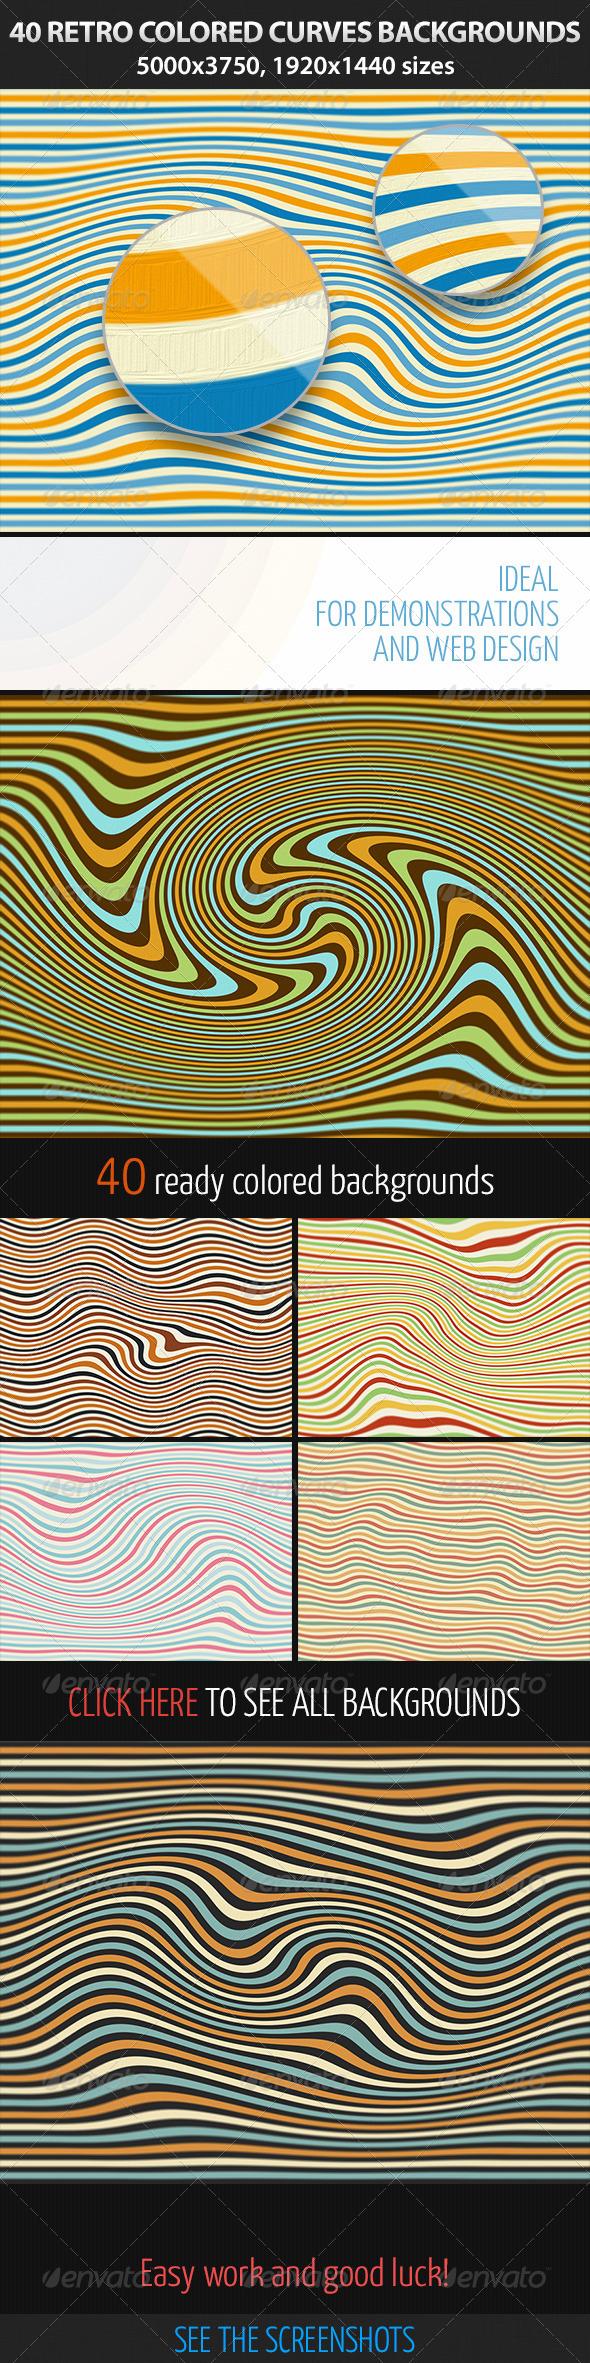 40 Retro Colored Curves